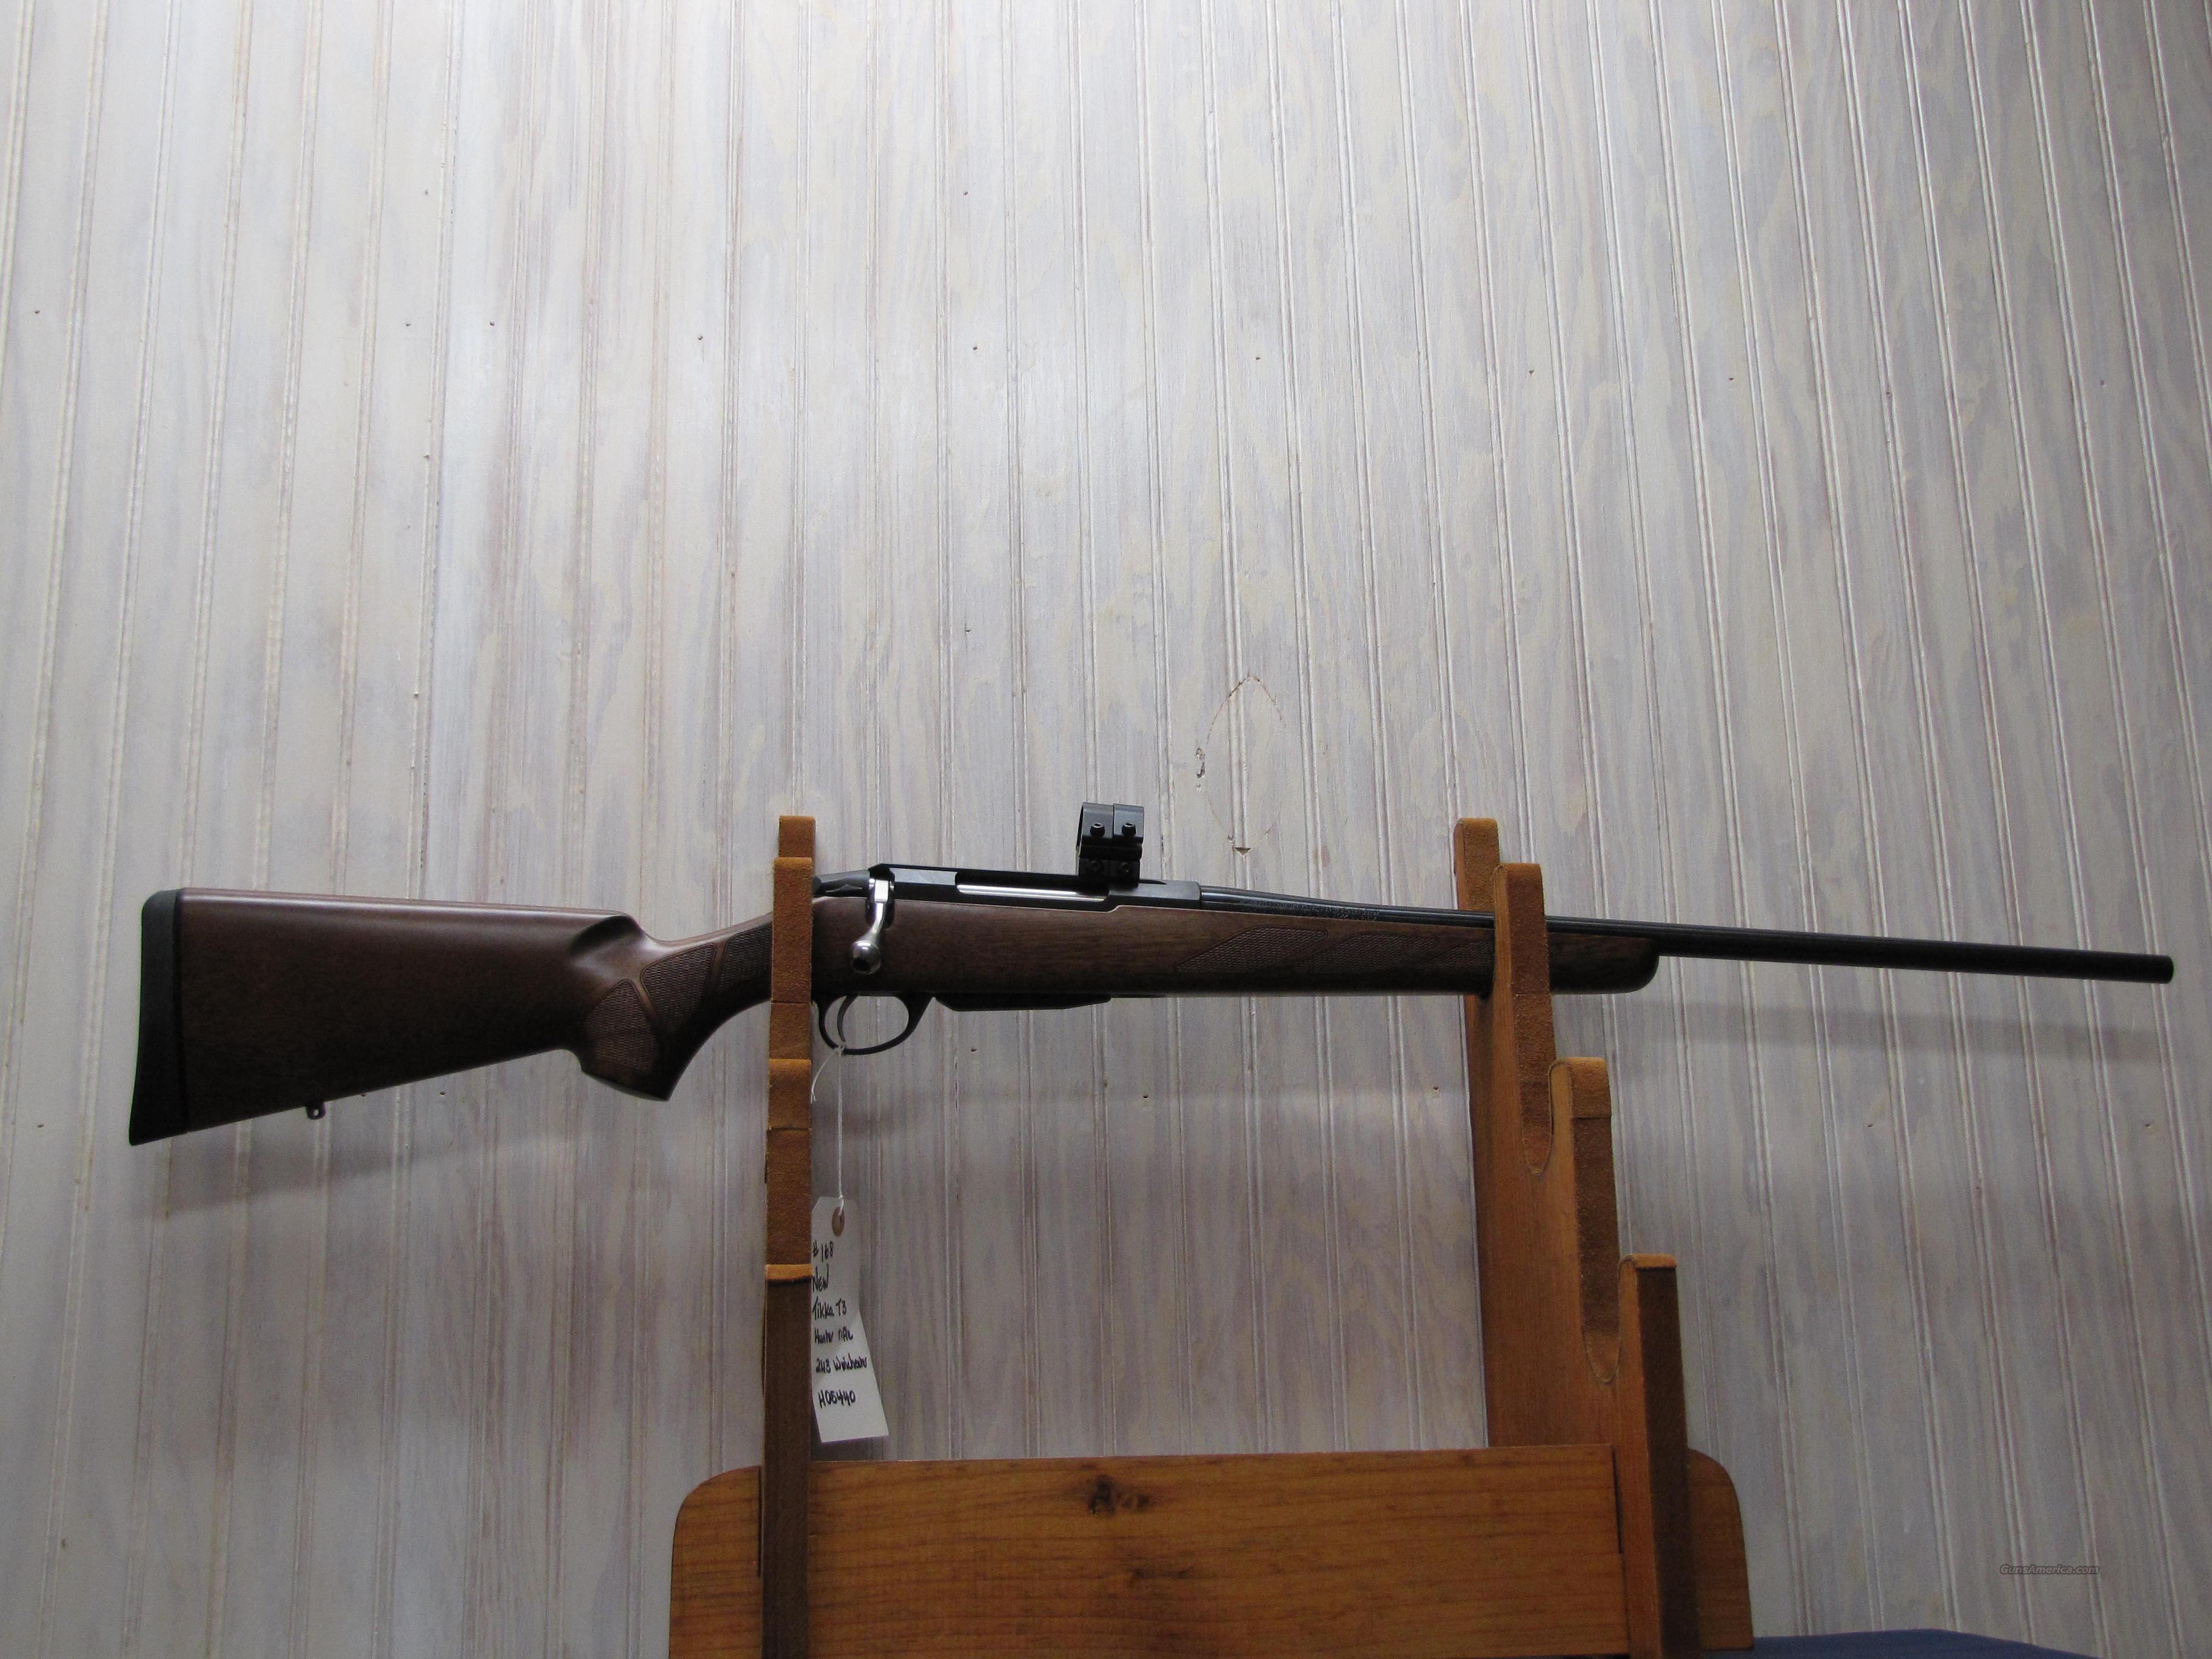 Tikka T3 Hunter   Guns > Rifles > Tikka Rifles > T3